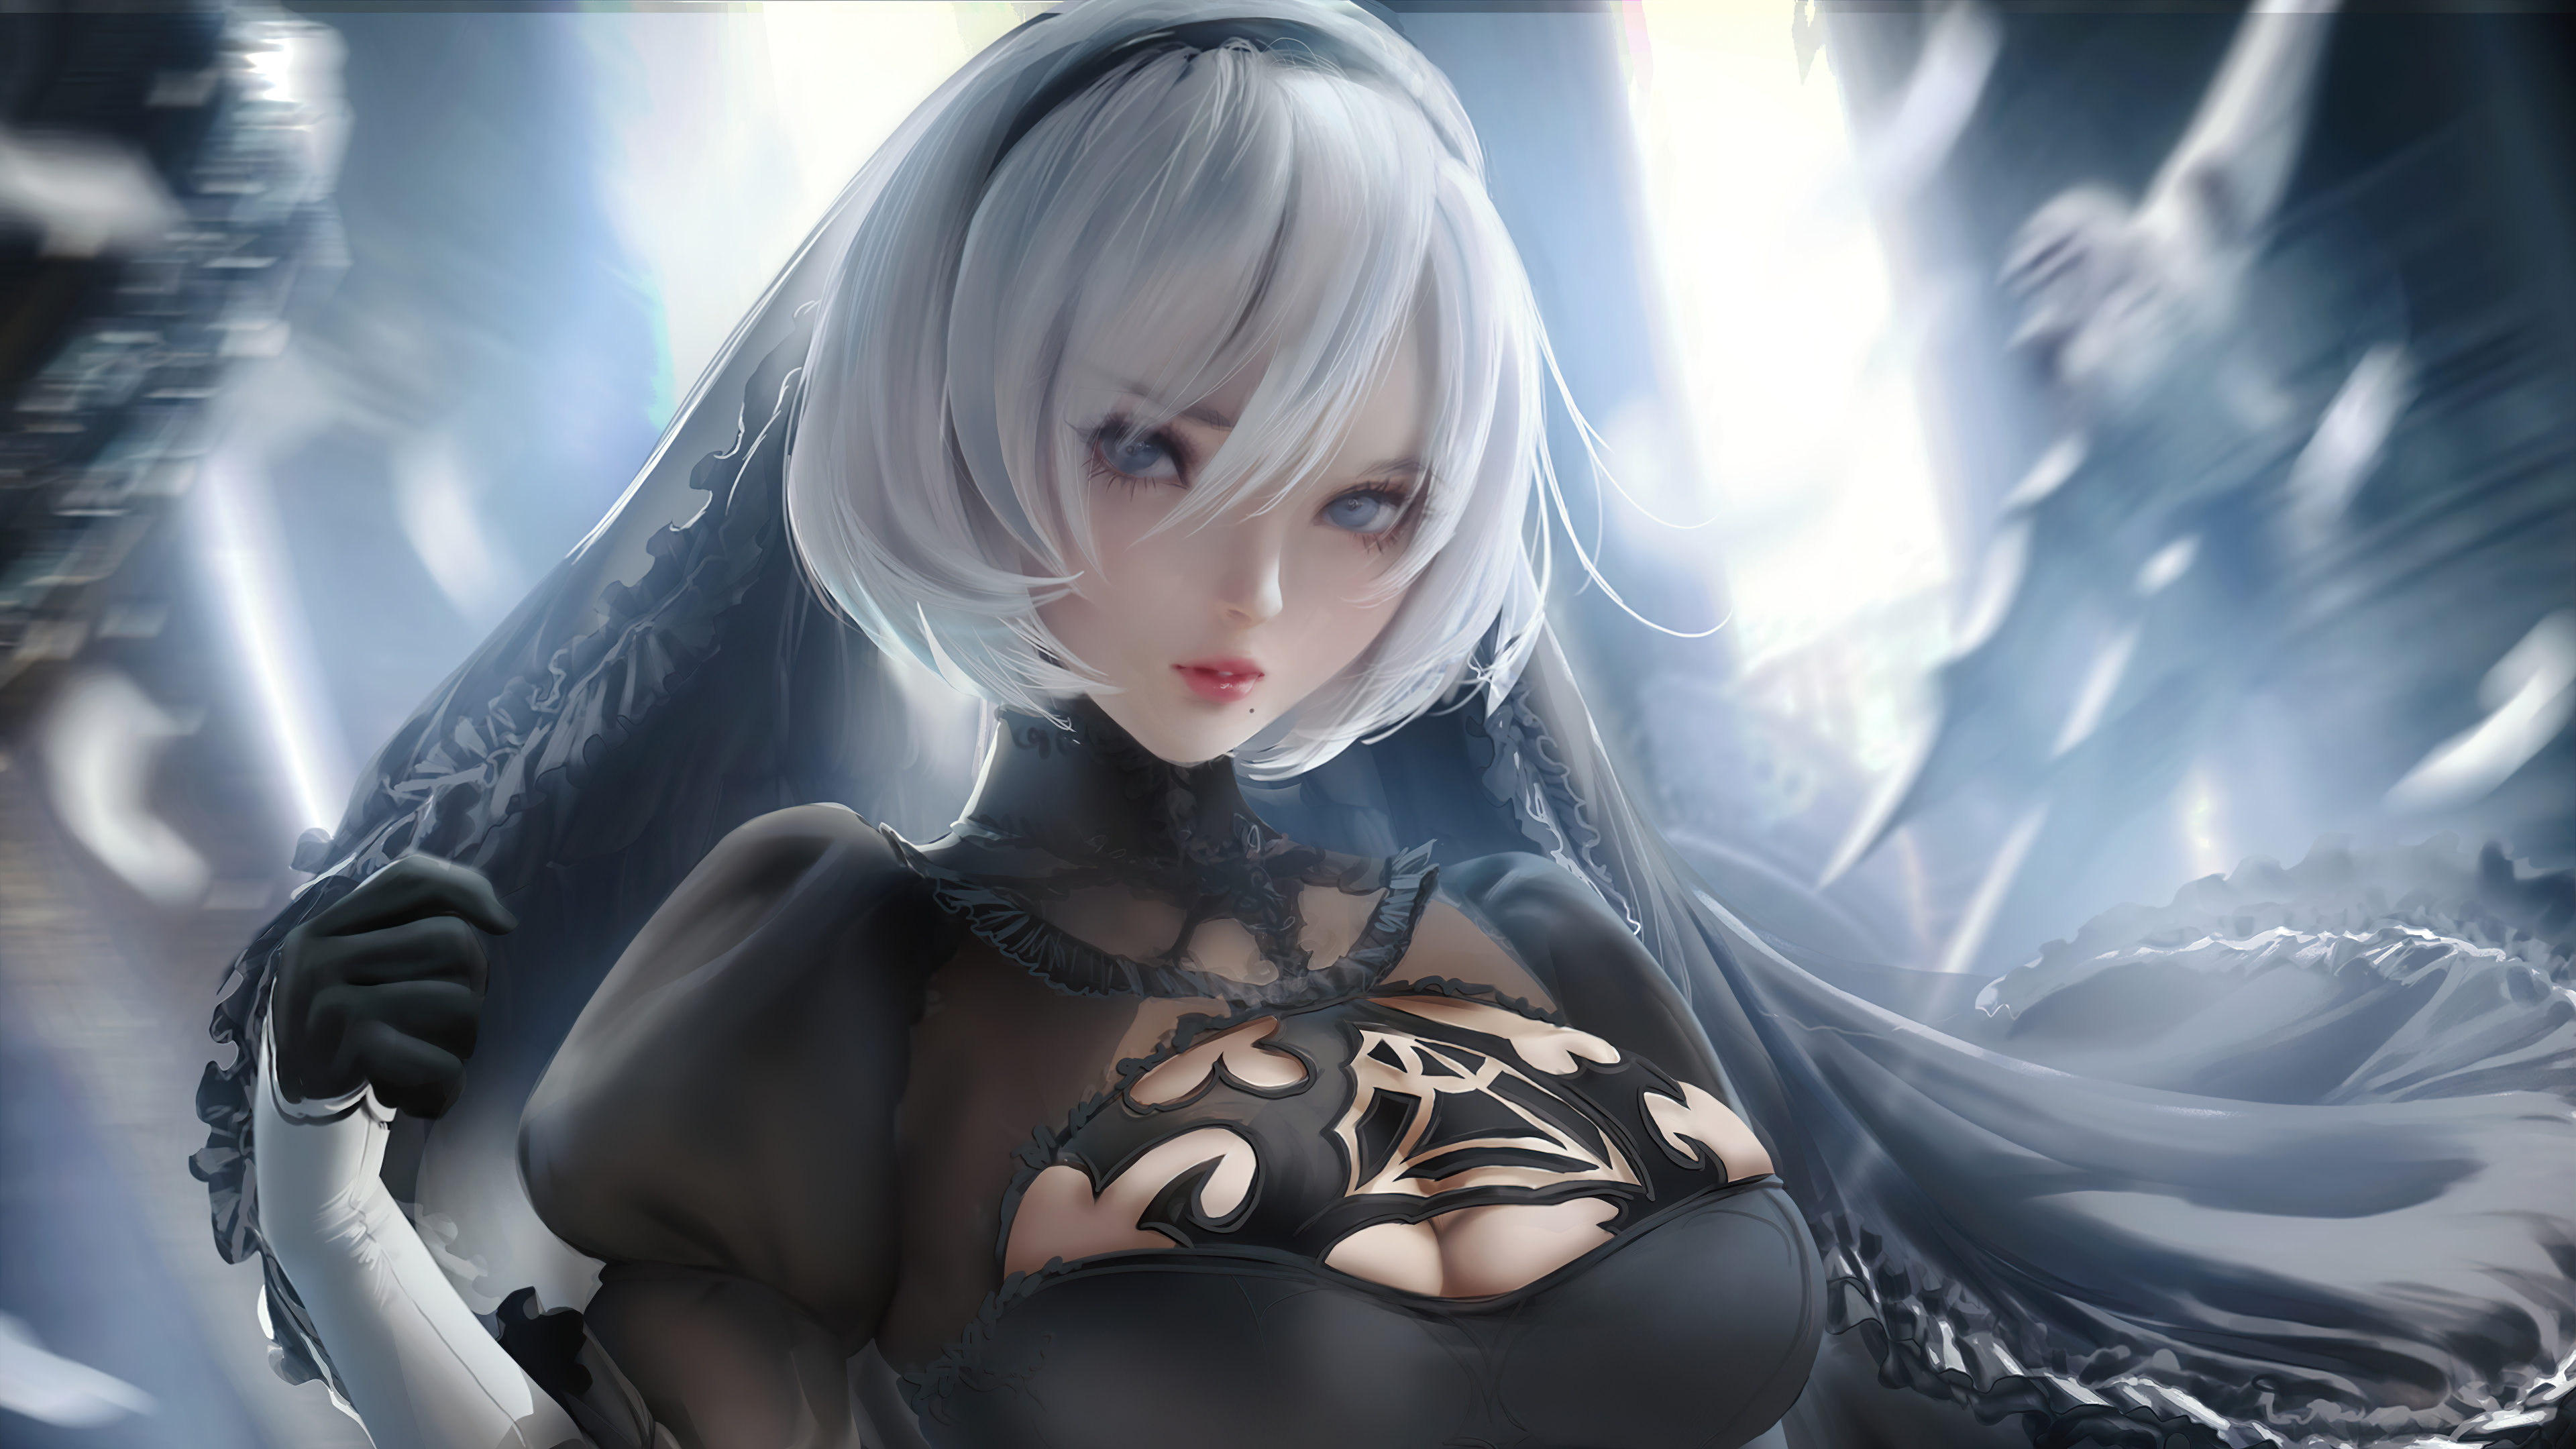 Anime Wallpaper 2B Nier Automata Black Dress